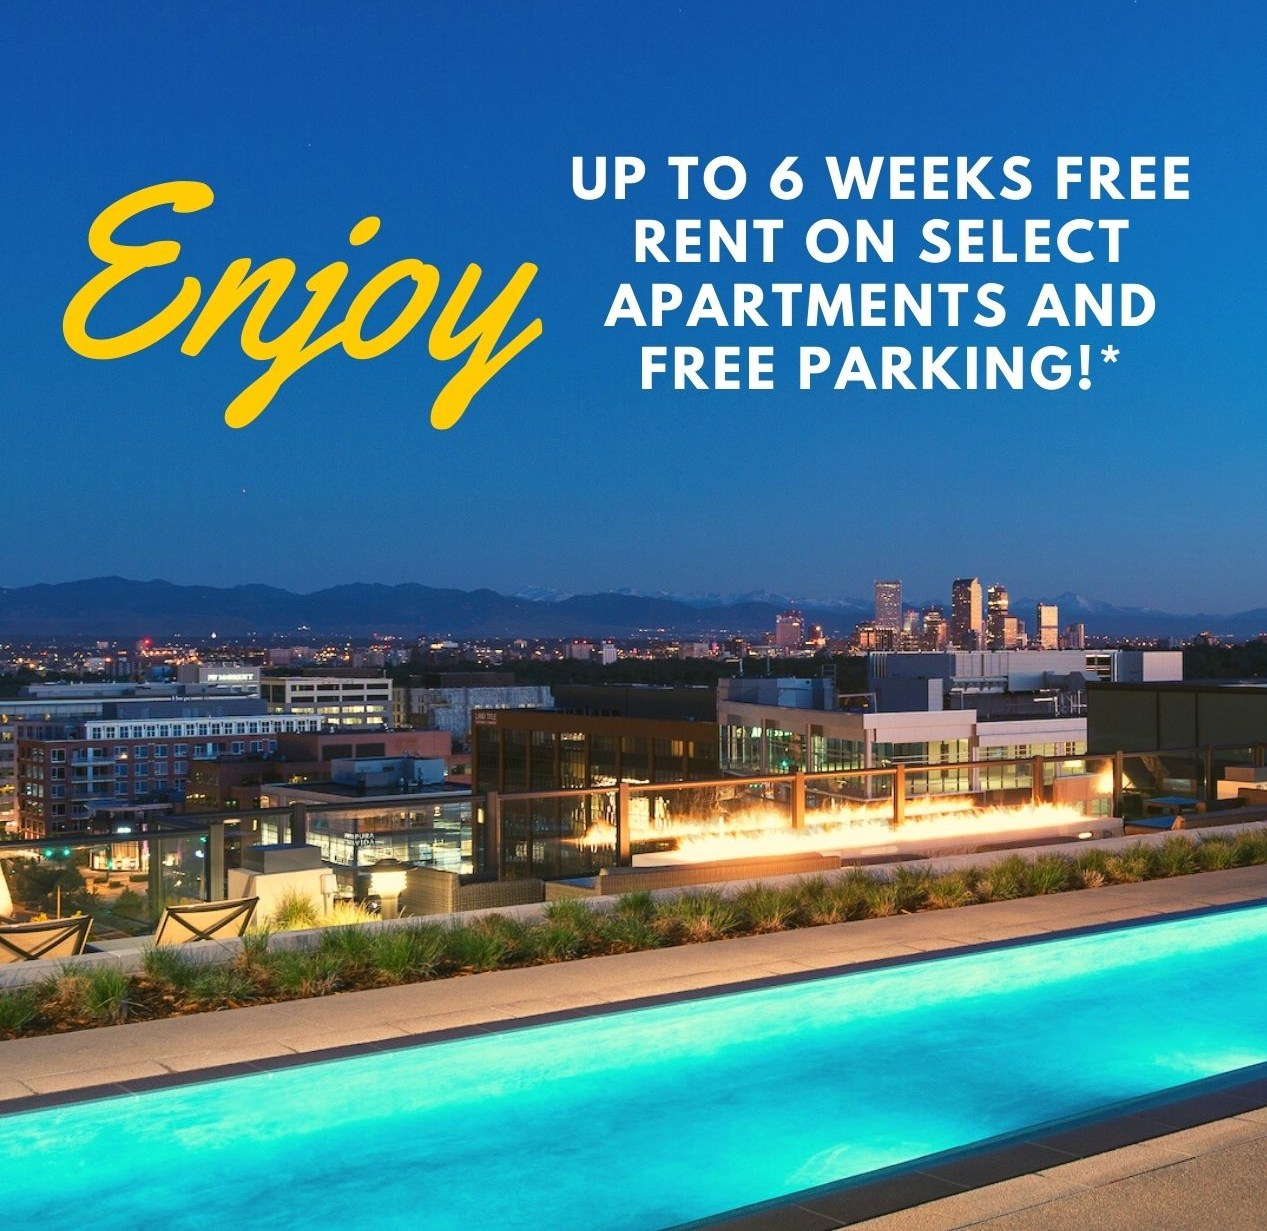 Steele Creek - Denver, CO apartments for rent